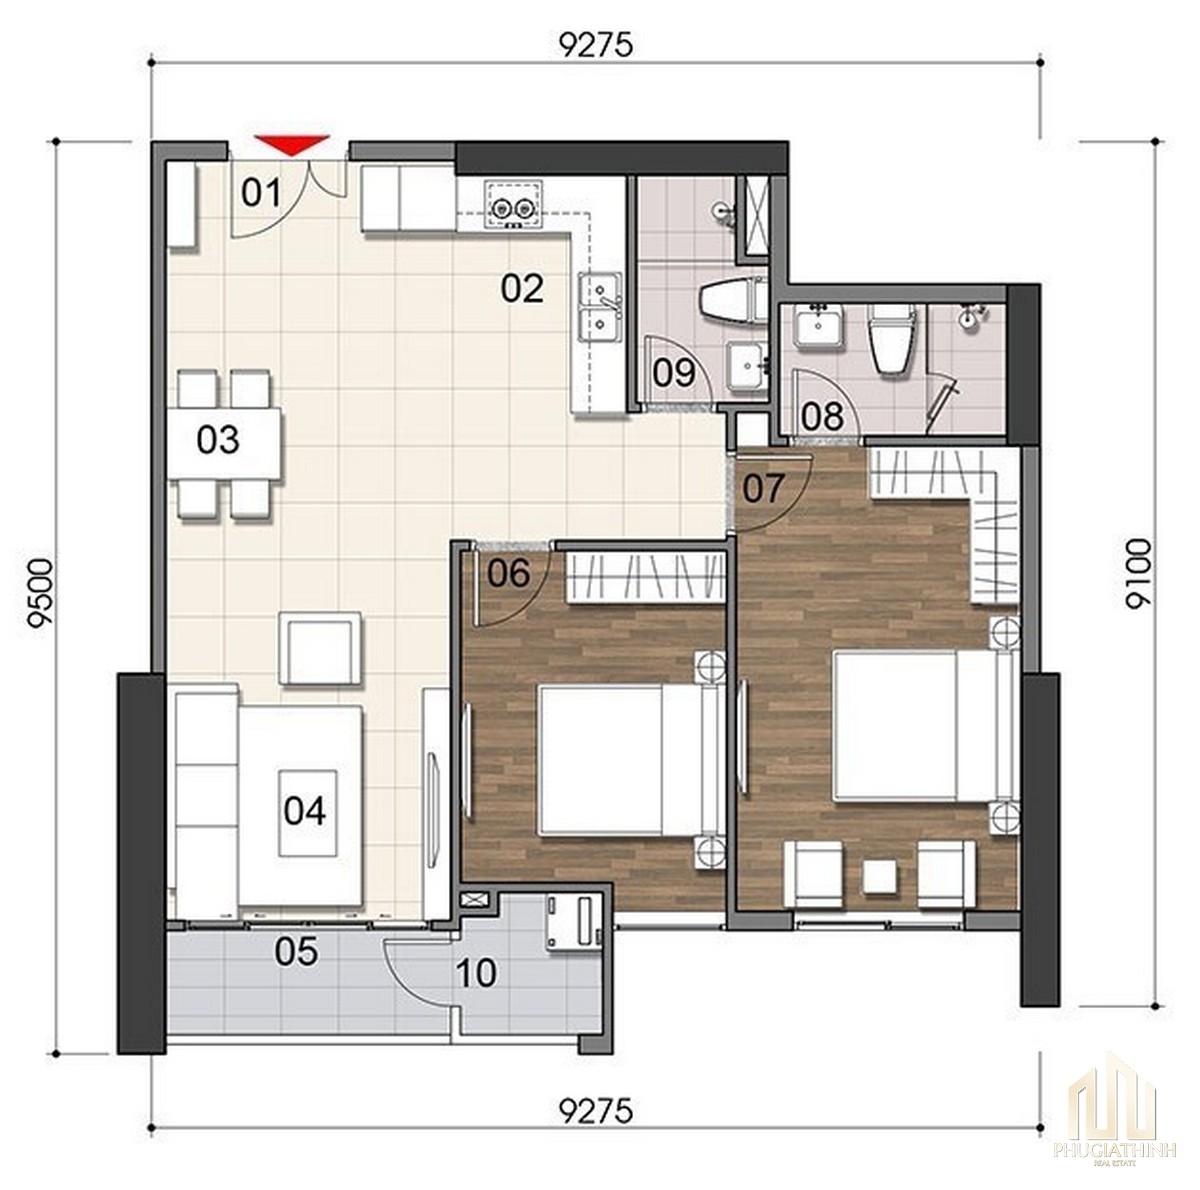 Thiết kế dự án căn hộ Gem Riverside Quận 2